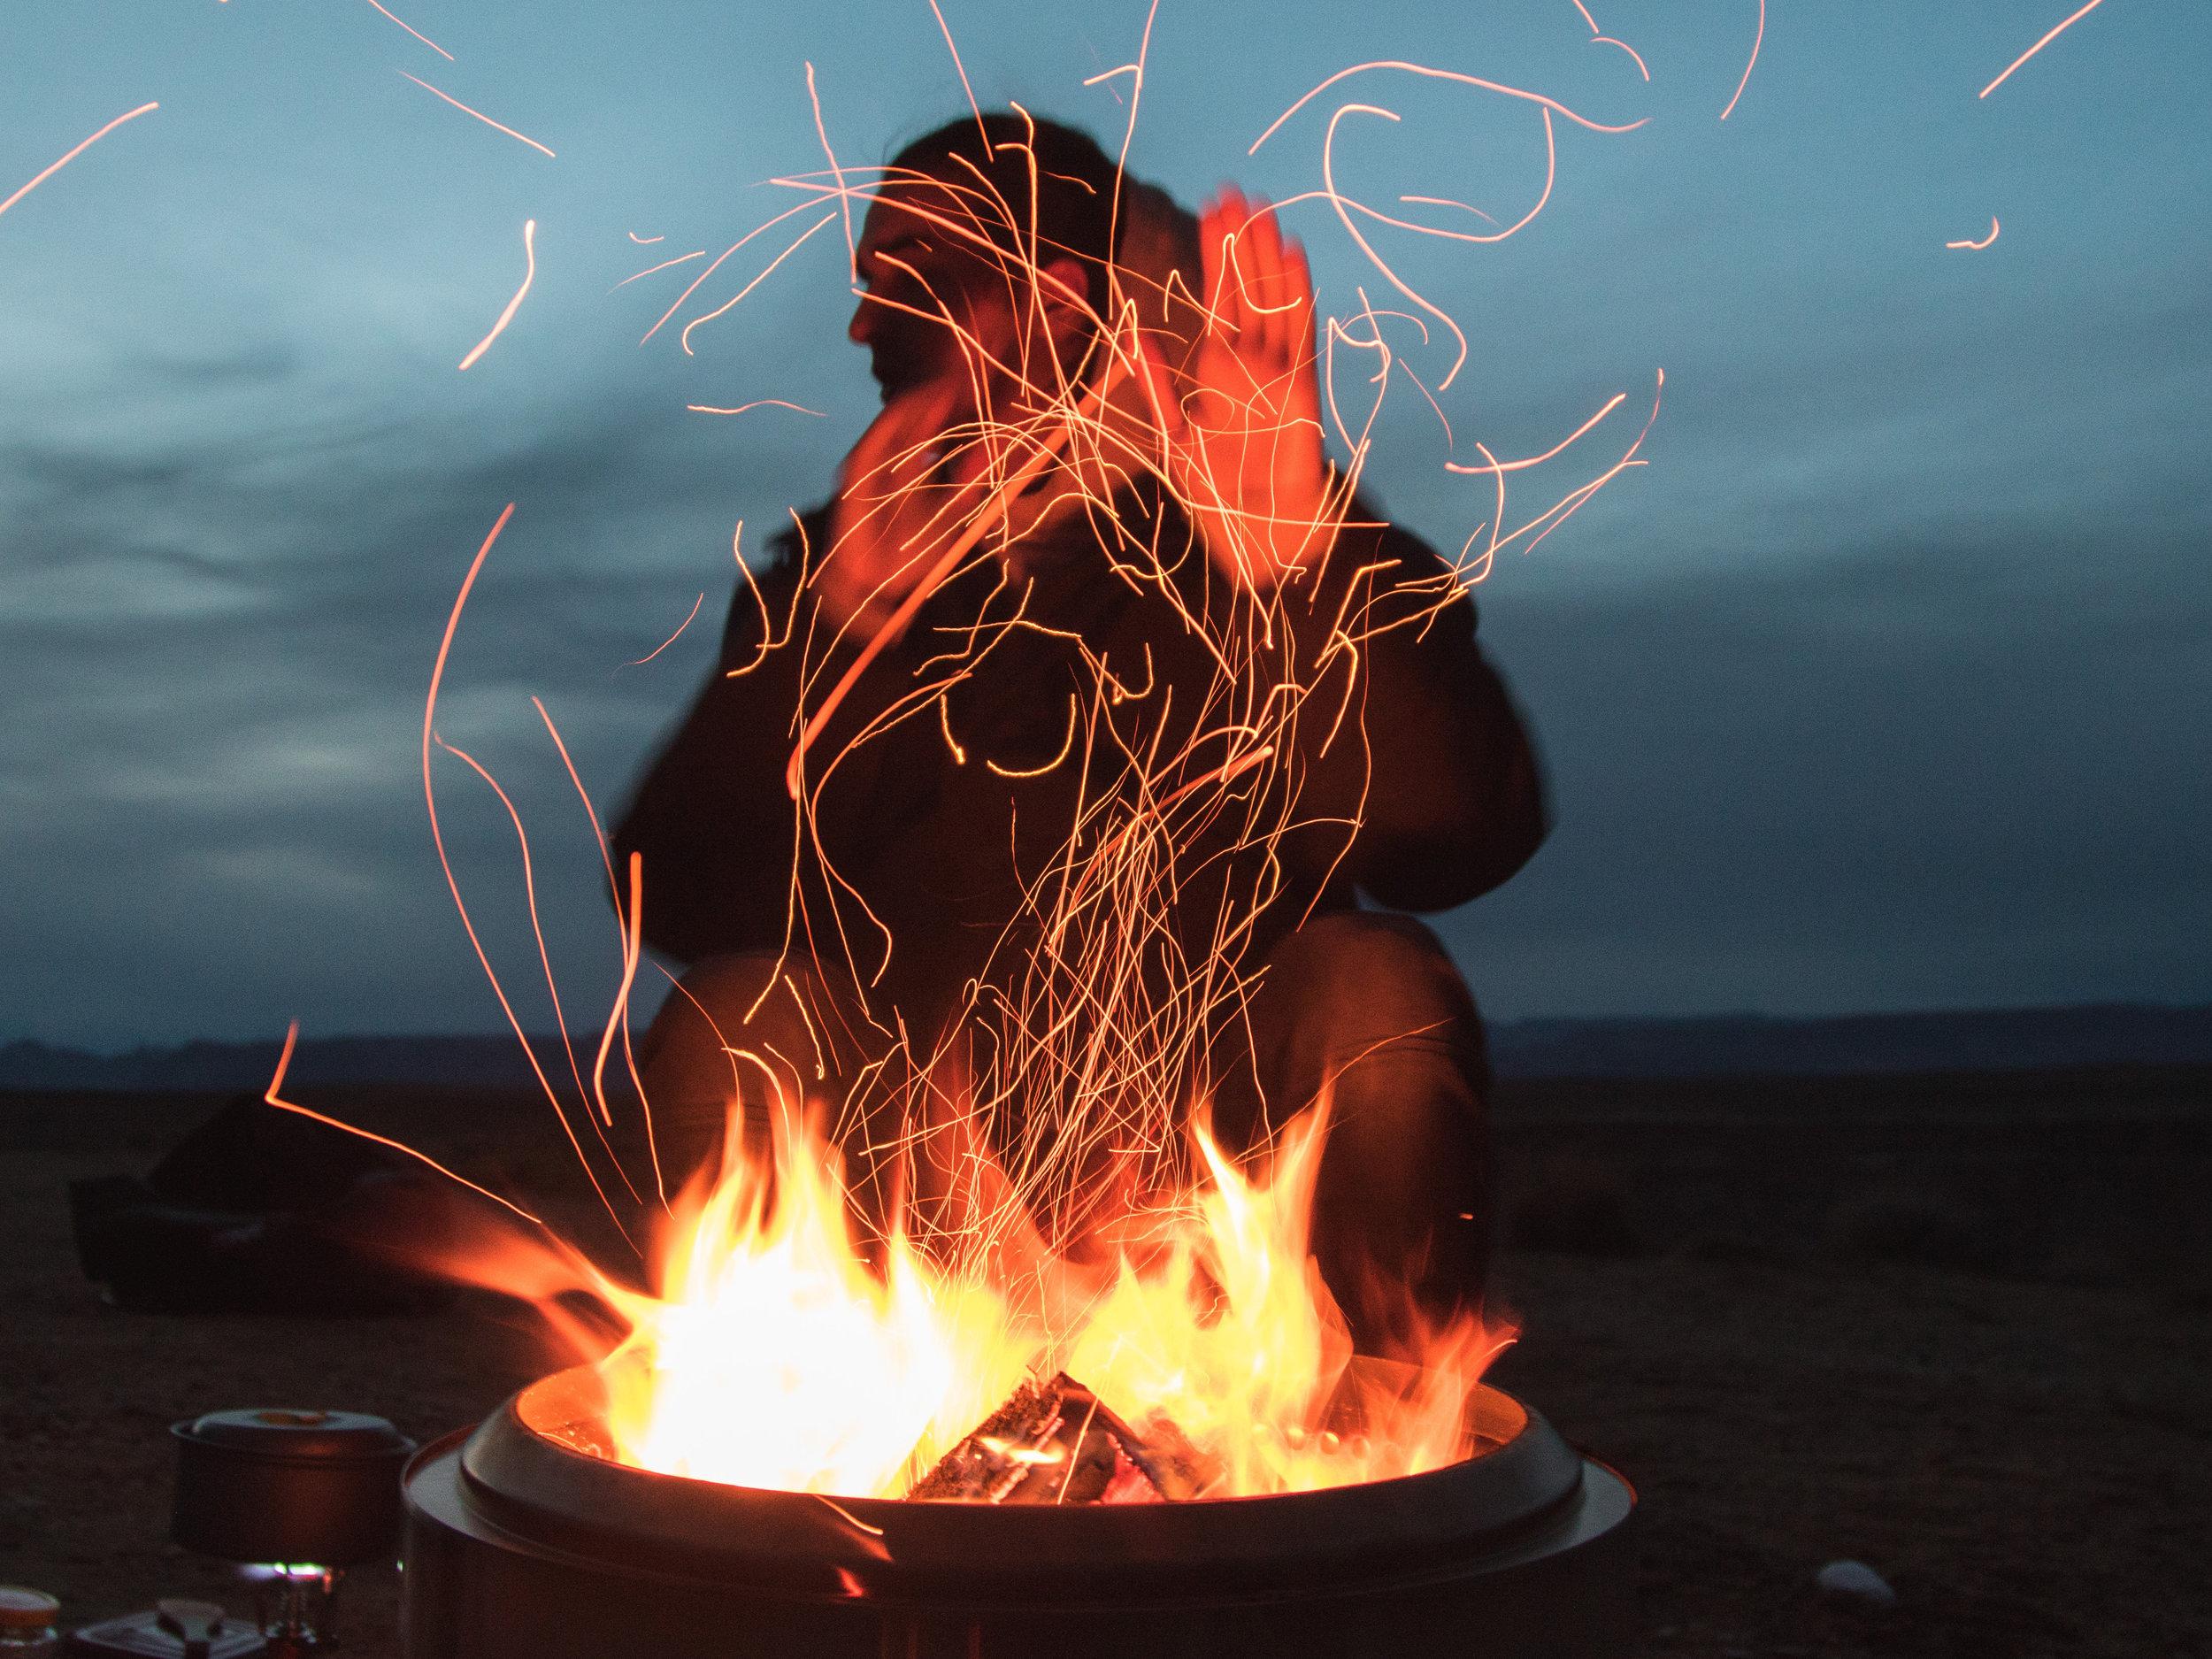 7:14 - bonfire.jpg